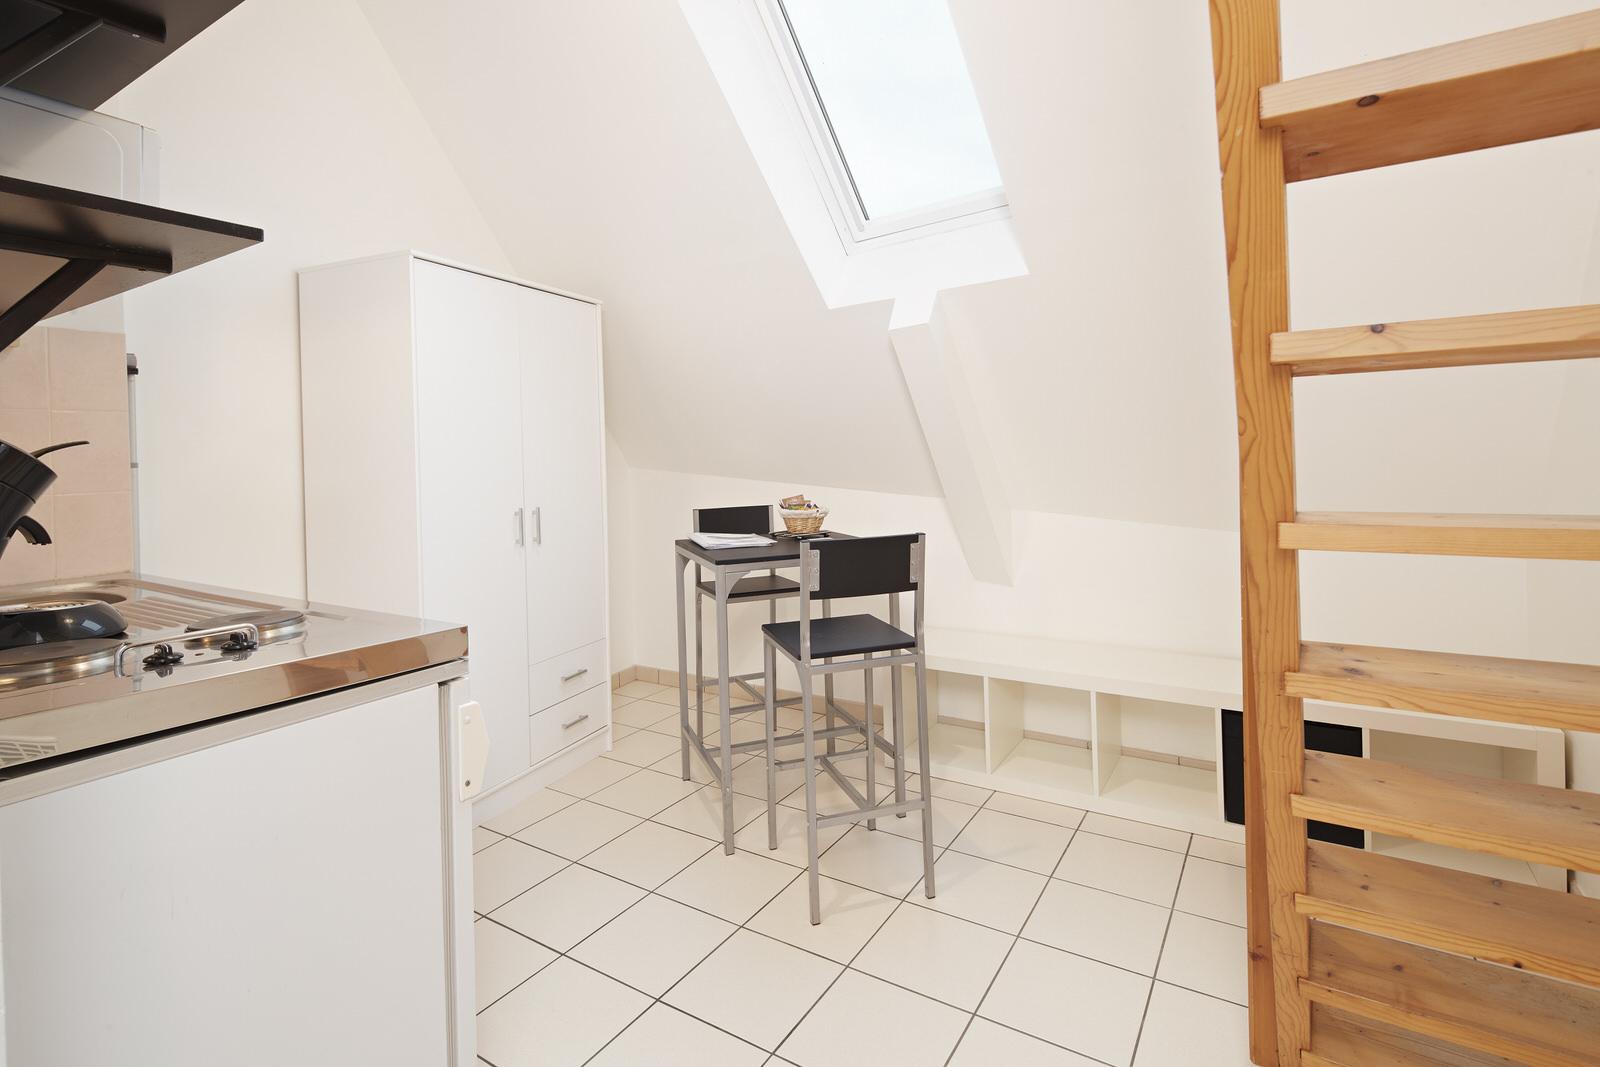 h tel appartement location ancenis r sidence les douves. Black Bedroom Furniture Sets. Home Design Ideas